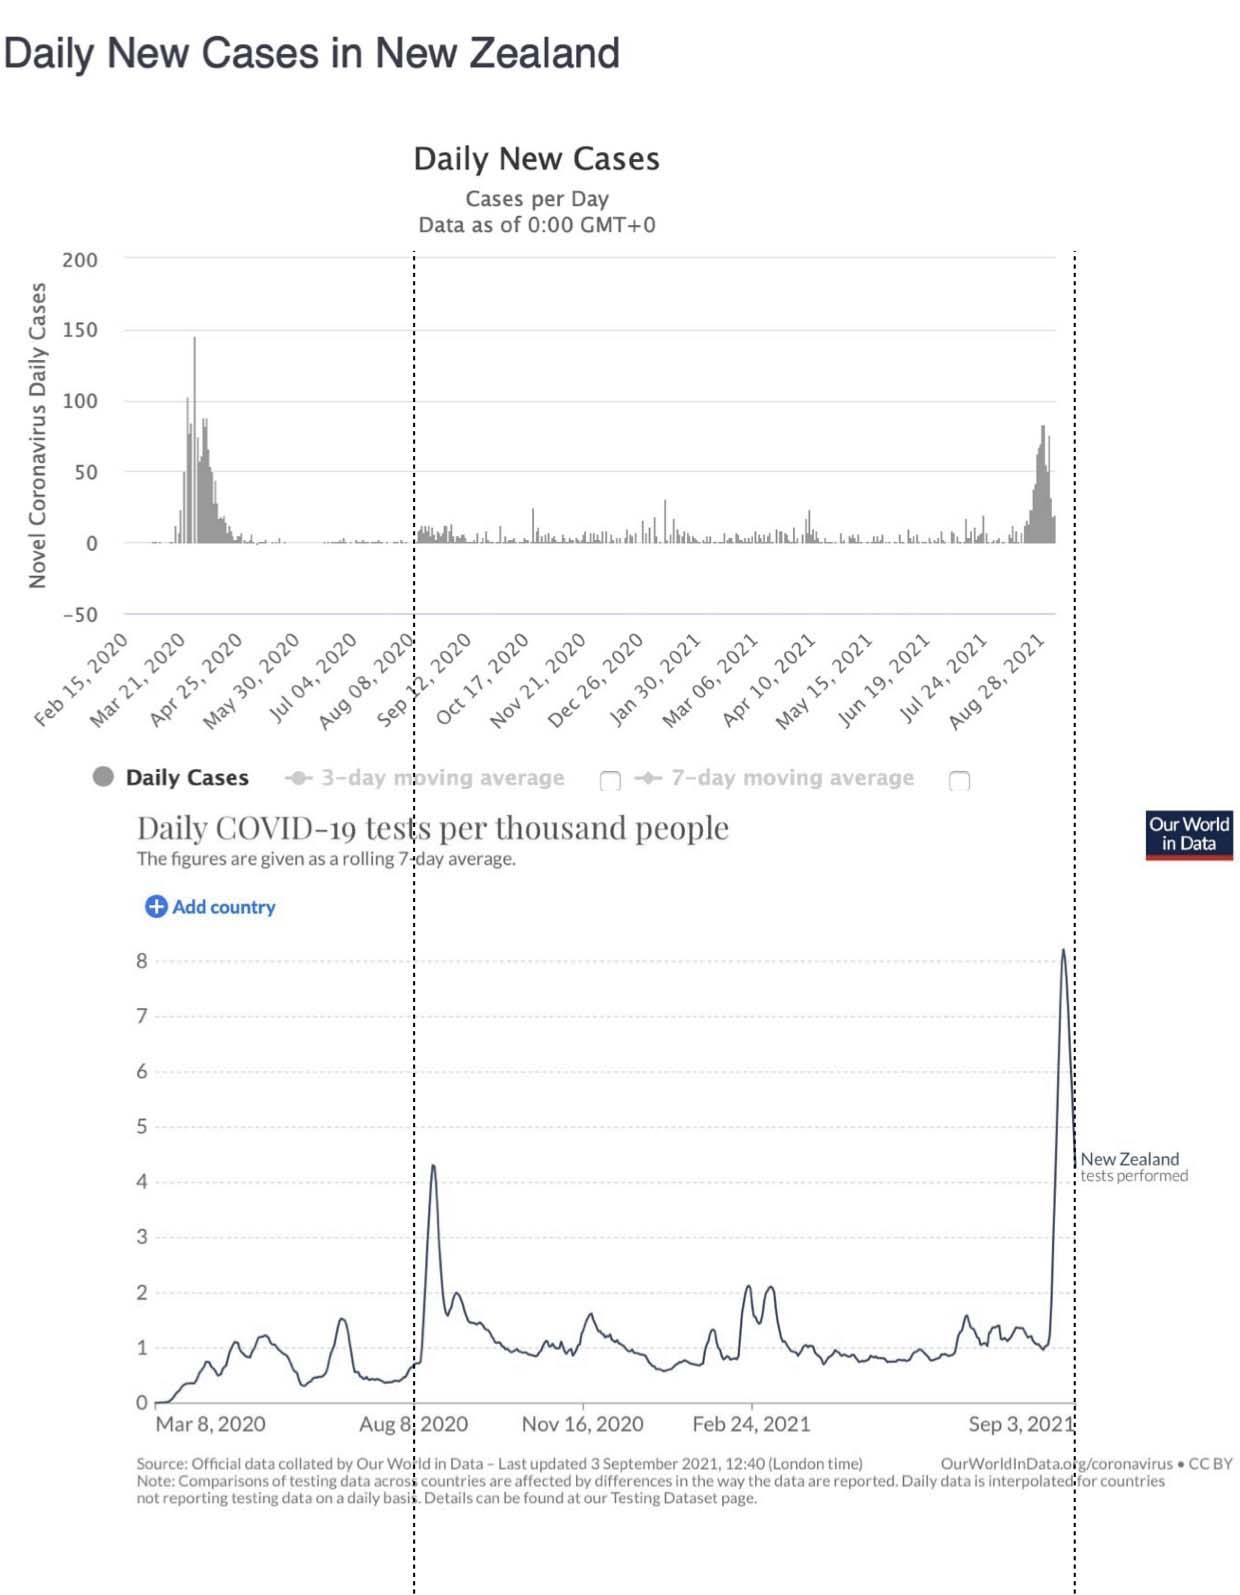 NZ-dailycases-tests.jpg